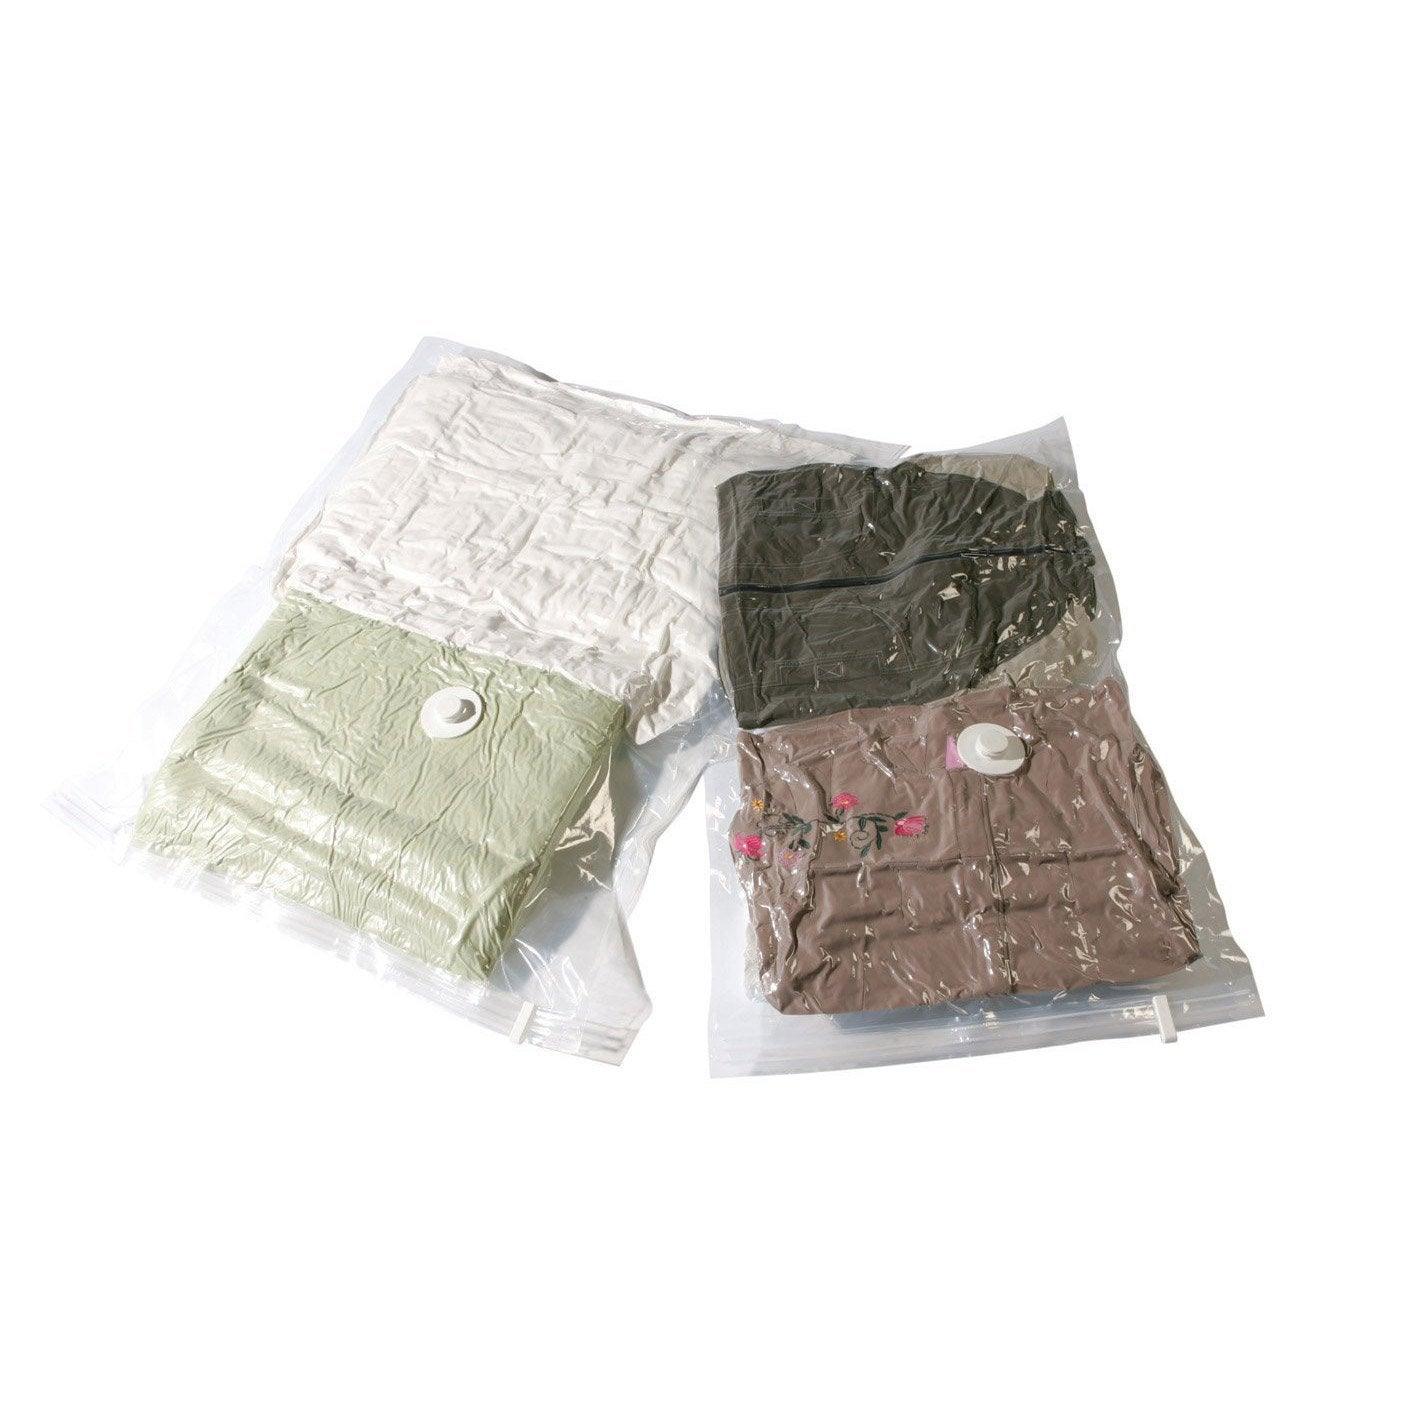 lot de 2 sacs rangement sous vide compactor translucide x xp leroy merlin. Black Bedroom Furniture Sets. Home Design Ideas